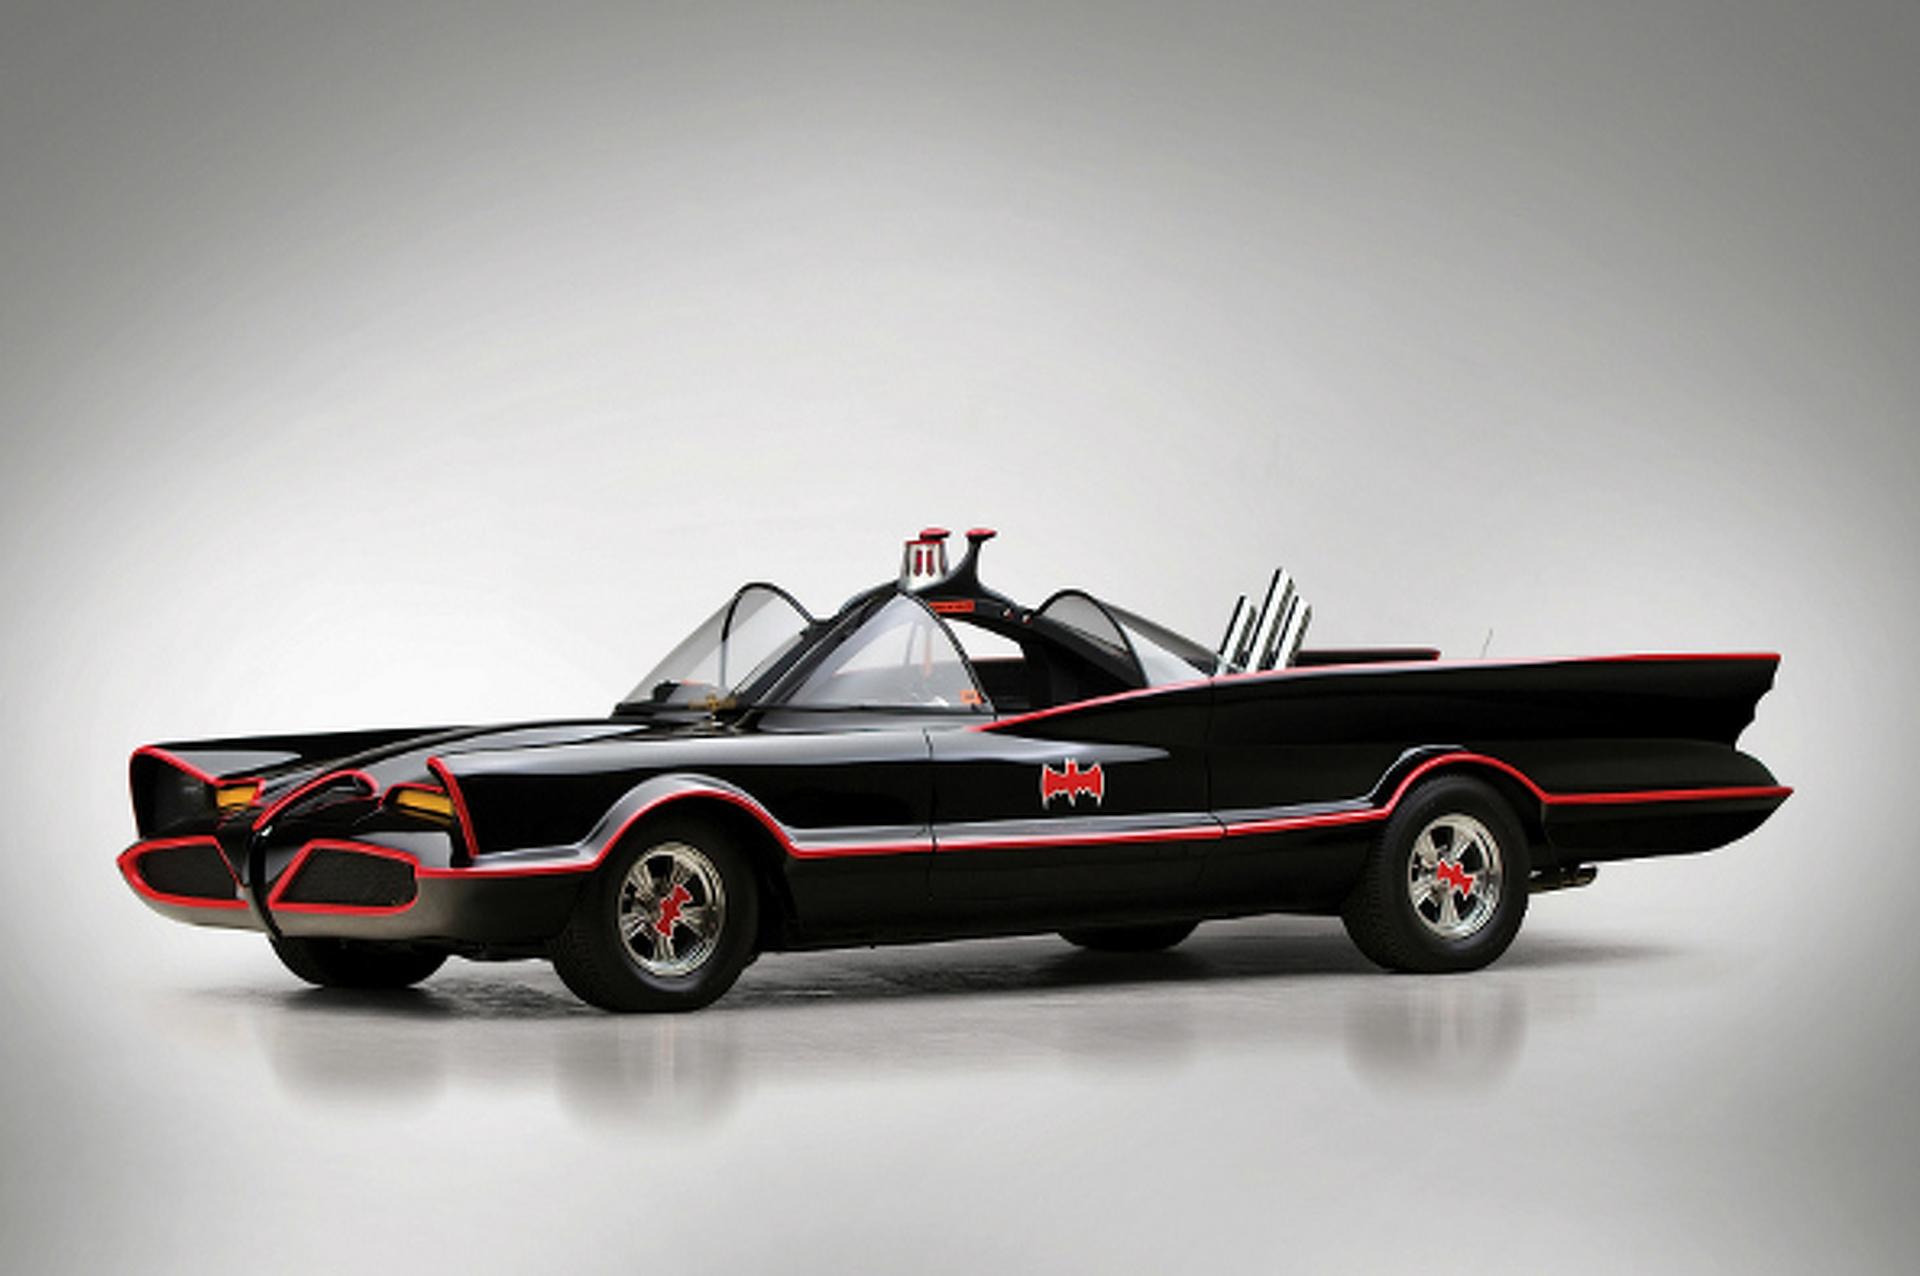 Barrett-Jackson: Batmobile Sells for $4.62M, Sets Auction Record